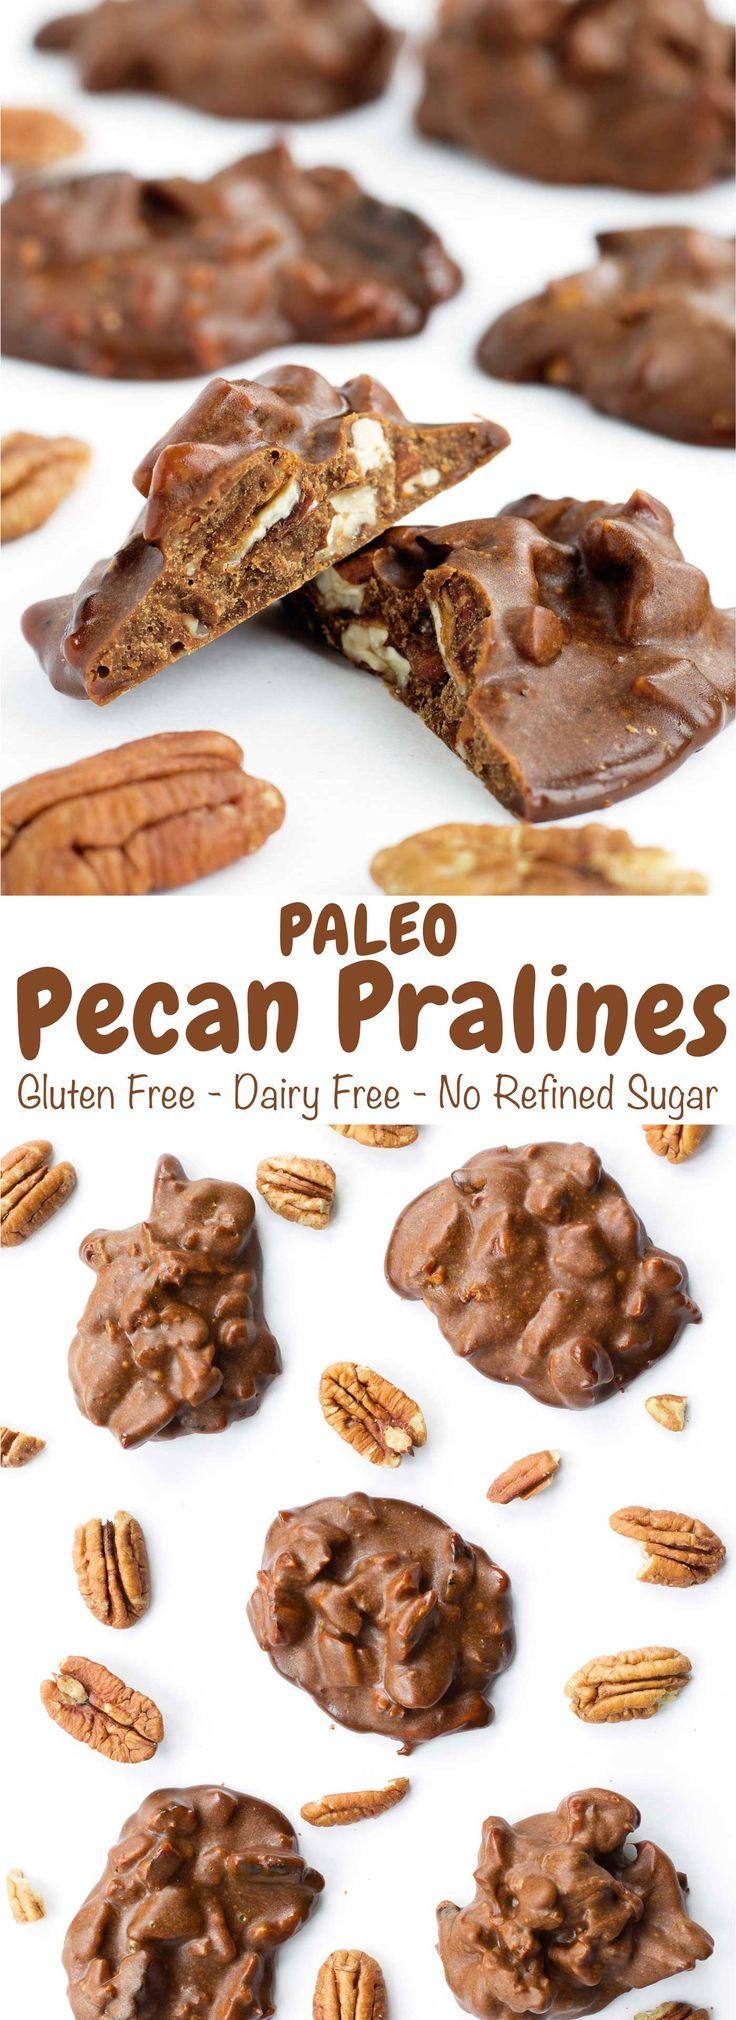 25+ best ideas about Pecan Pralines on Pinterest | Pecan ...